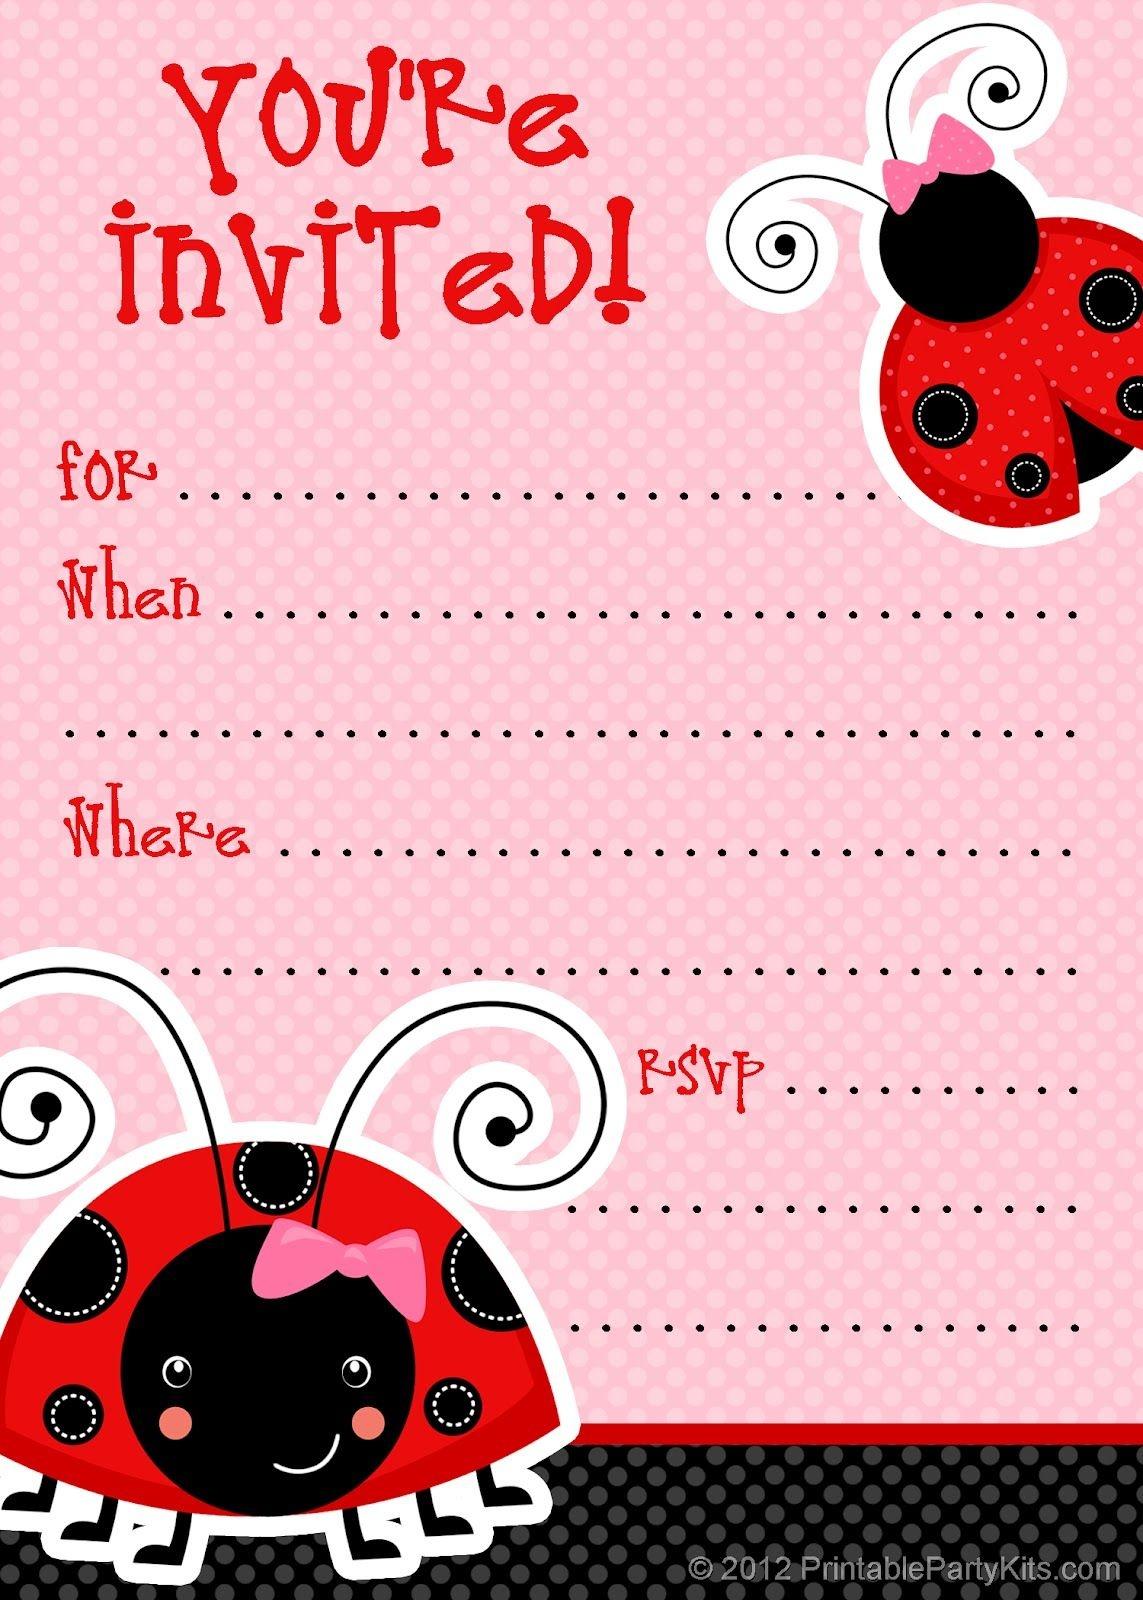 Free Ladybug Party Invitations From Printablepartyinvitations - Free Printable Ladybug Baby Shower Invitations Templates